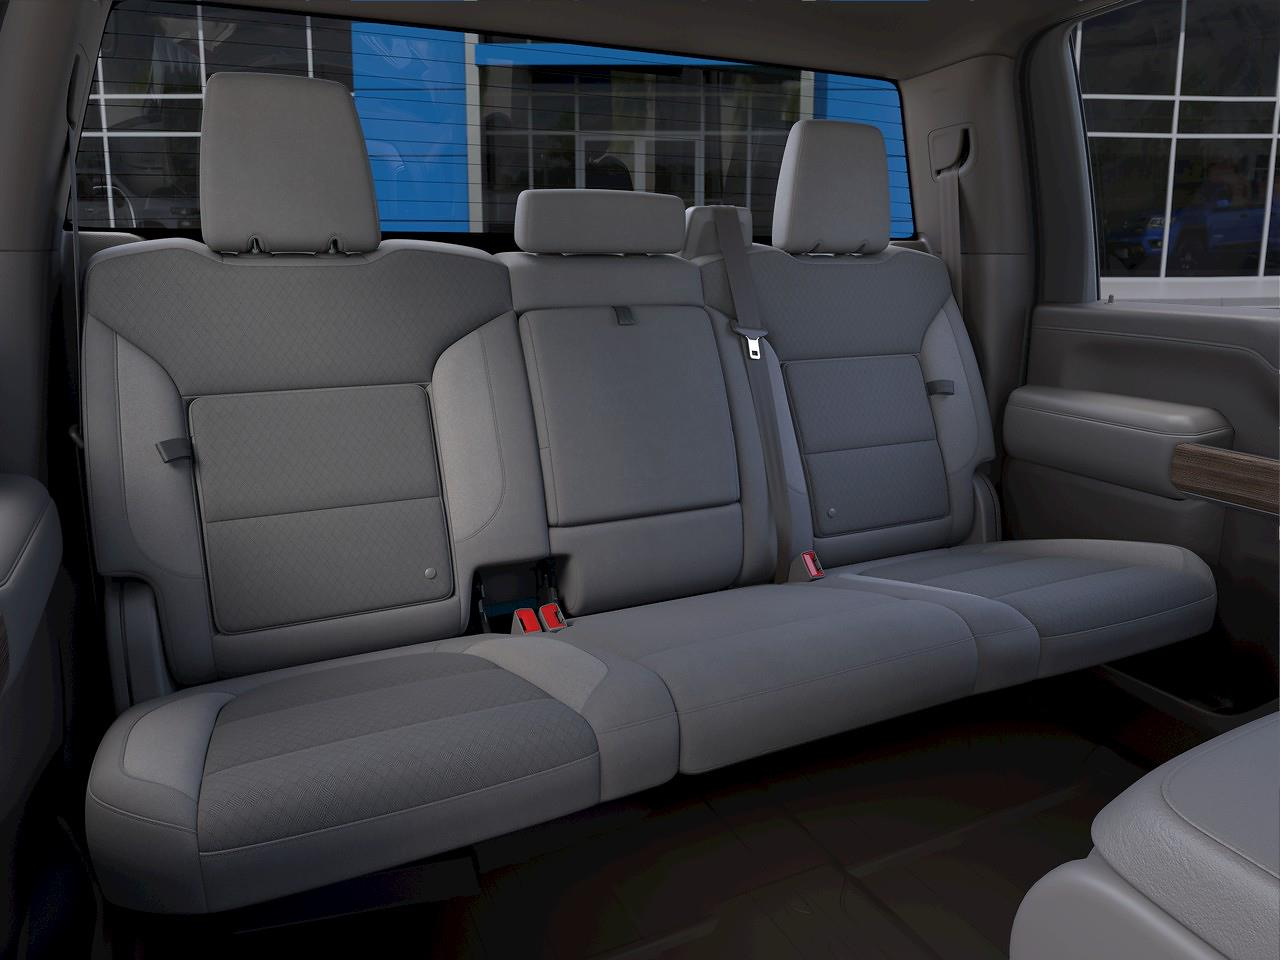 2021 Chevrolet Silverado 3500 Crew Cab 4x4, Pickup #Q210427 - photo 14